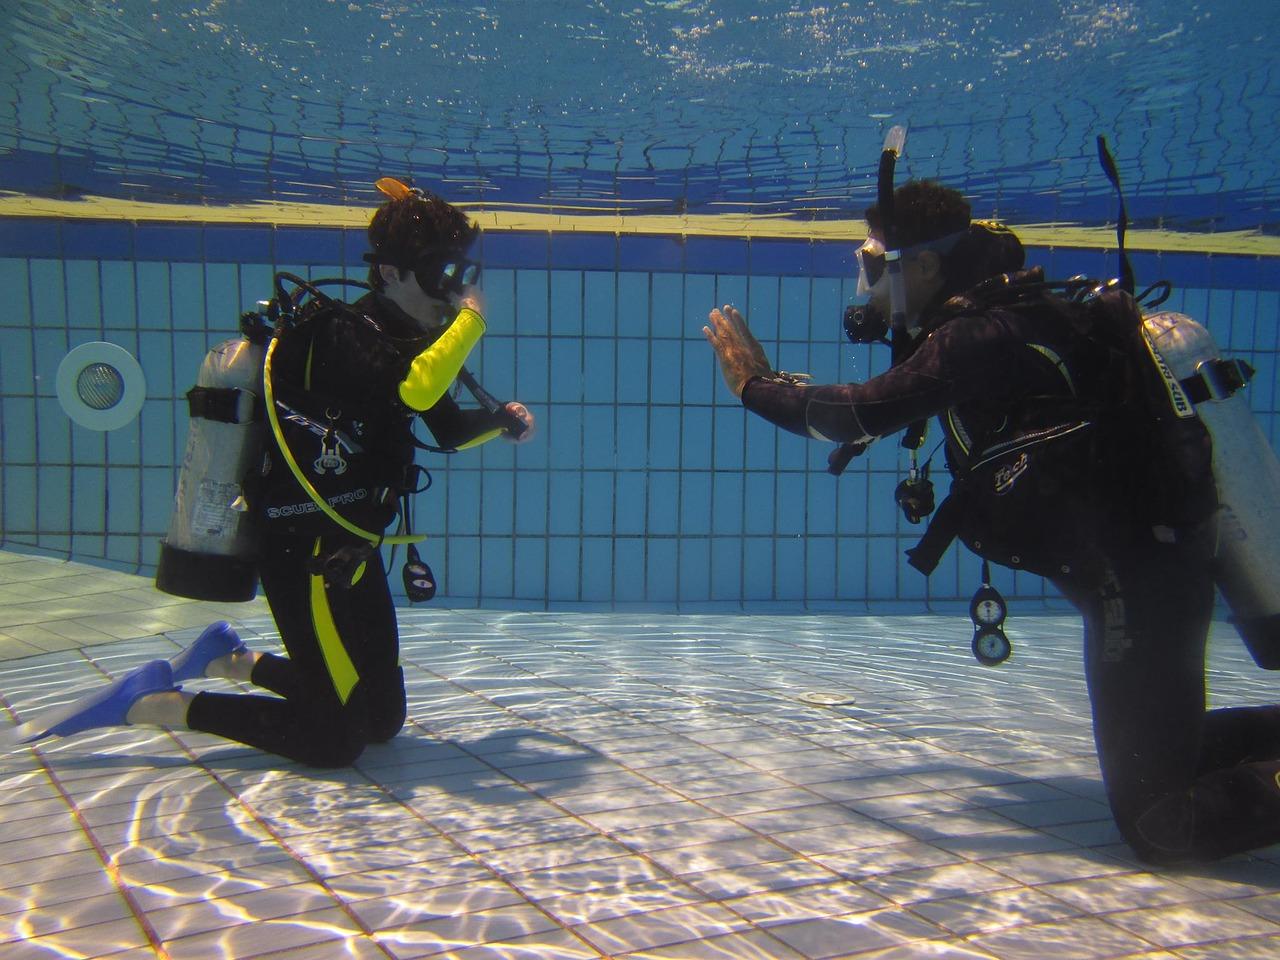 diving-2316453_1280